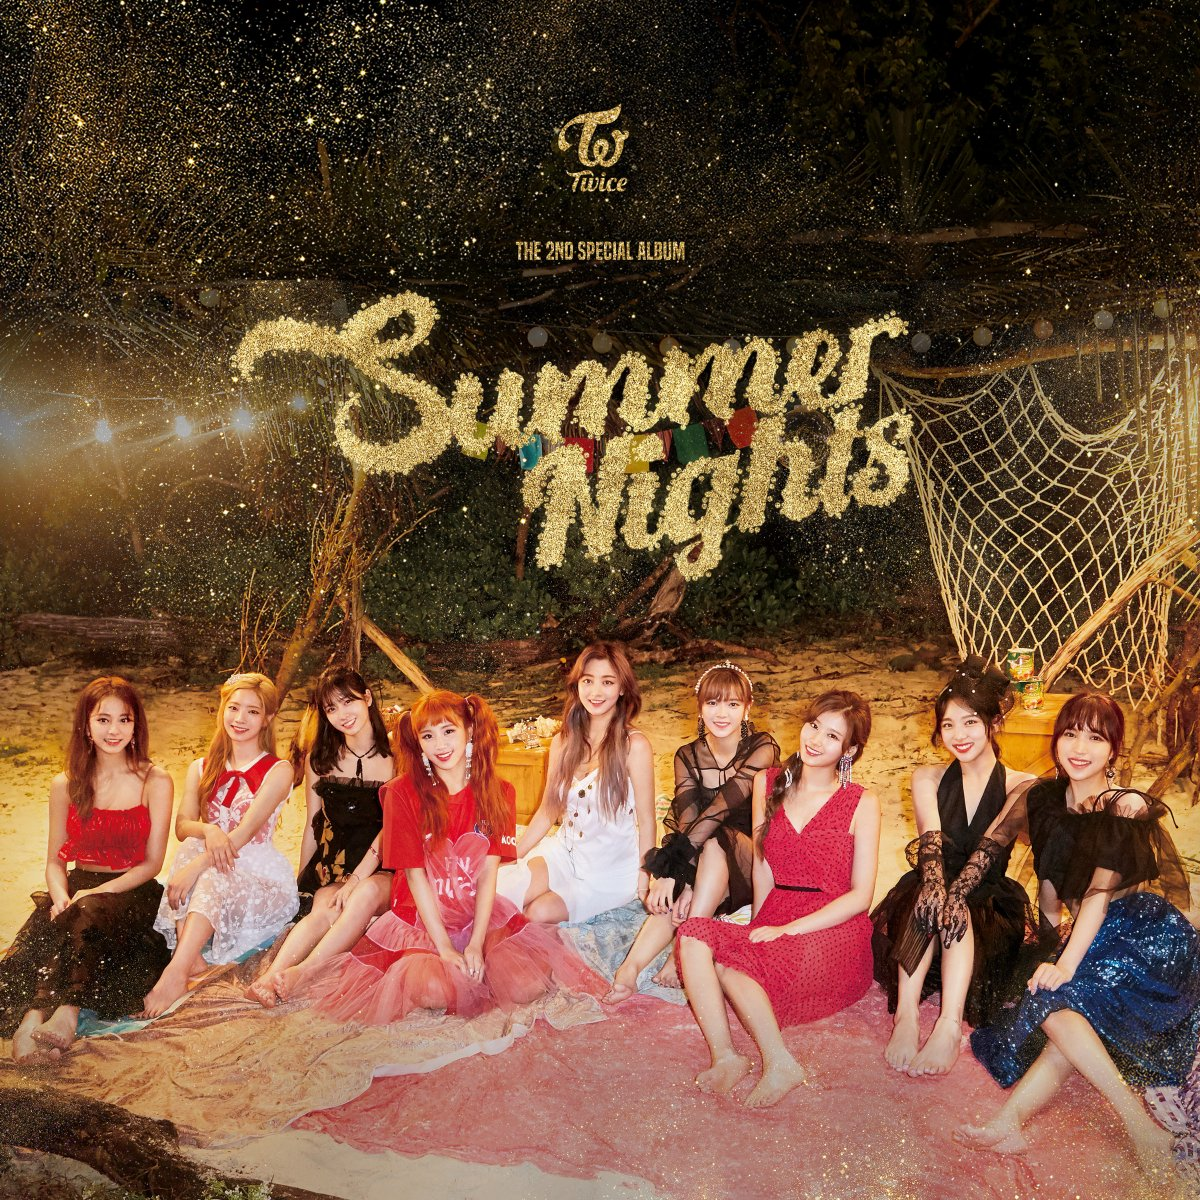 Twice kembali merilis album spesialnya yang bertajuk Summer Nights dengan lagu utama Dance The Night Away (dok. JYP Entertainment)